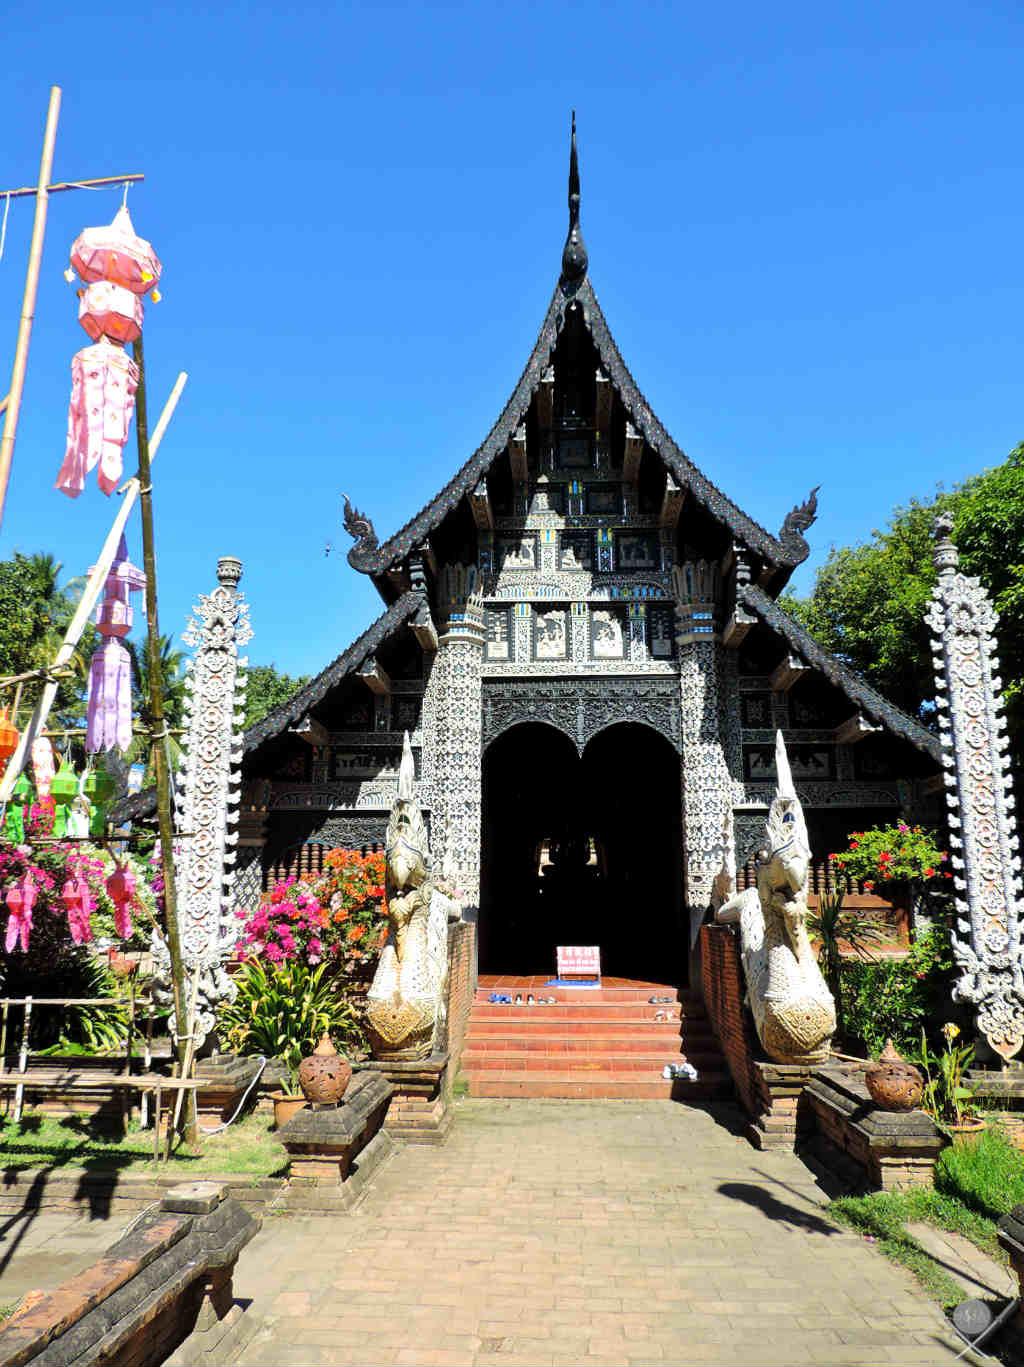 Thailand - Chiang Mai - Wat Lok Molee - Viagens - Vida de Tsuge - VDT